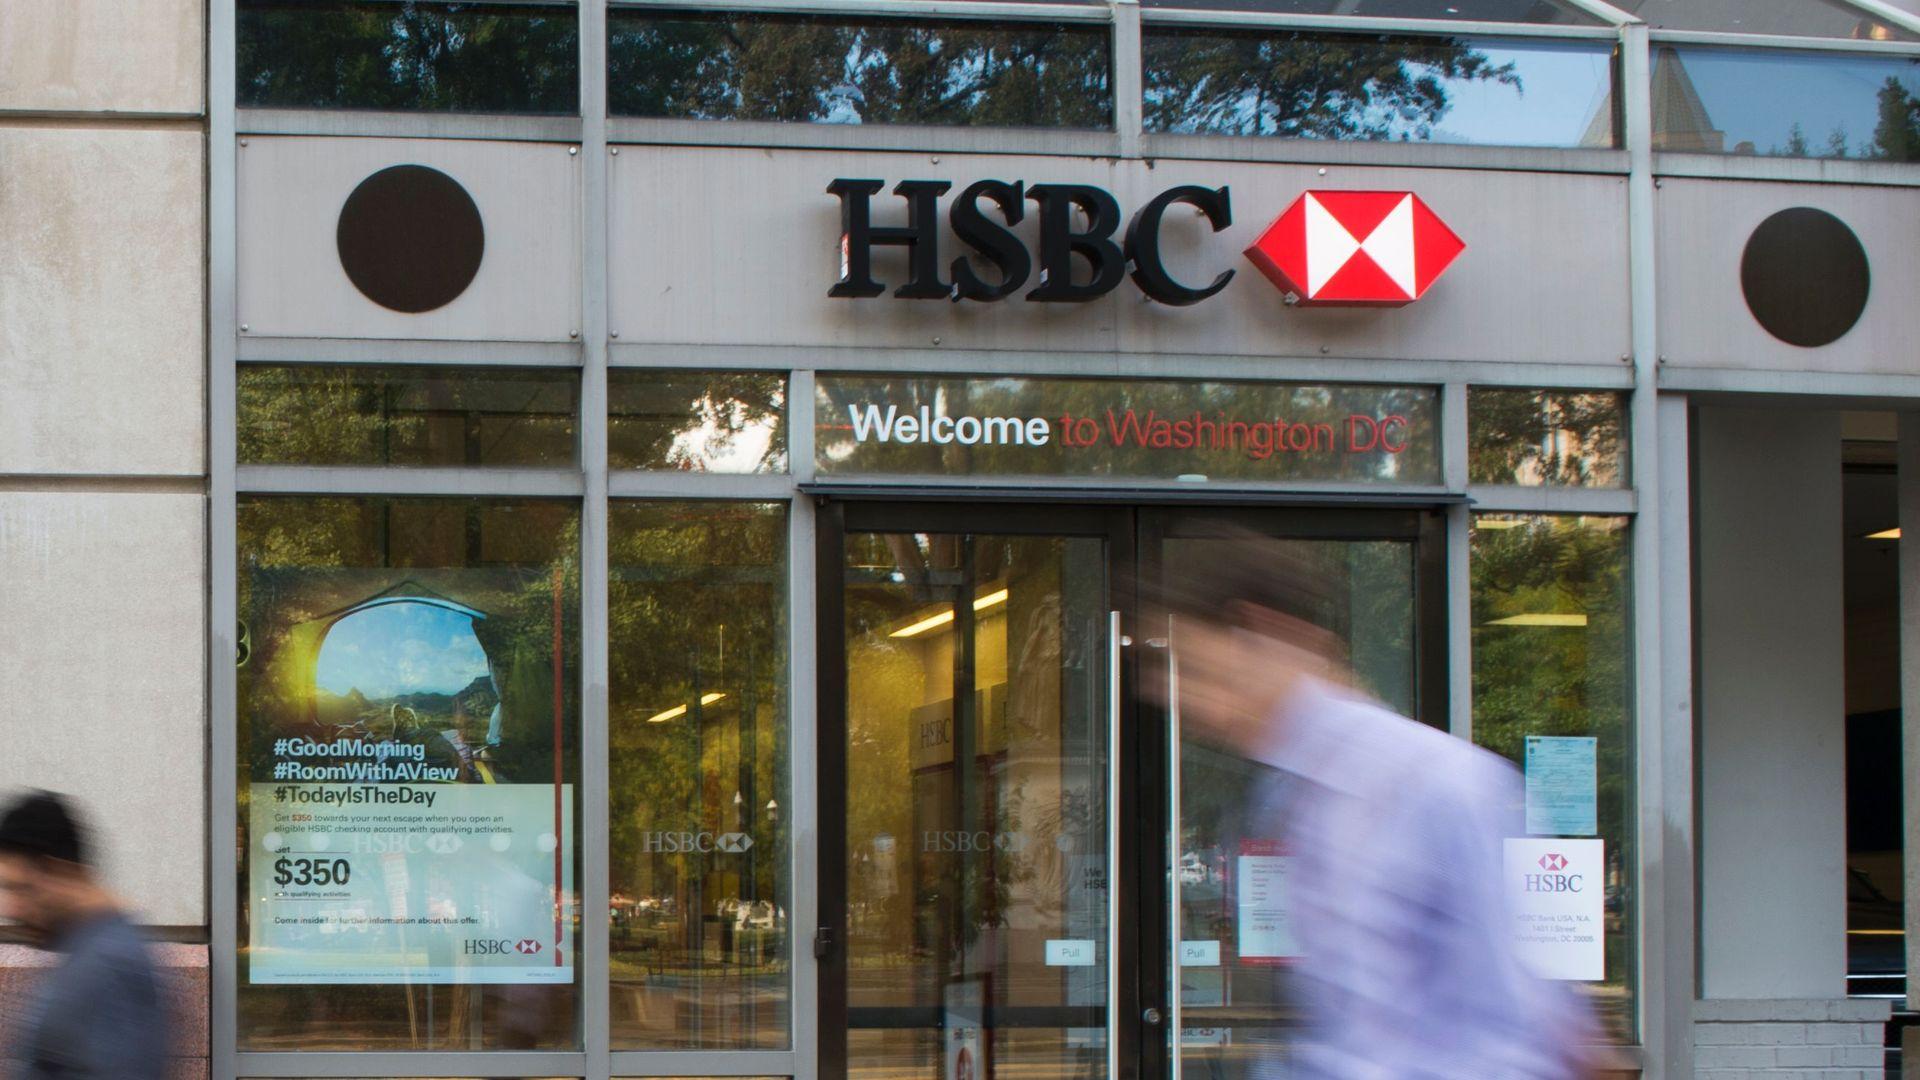 Scoop: HSBC hops on the robo-advising bandwagon - Axios